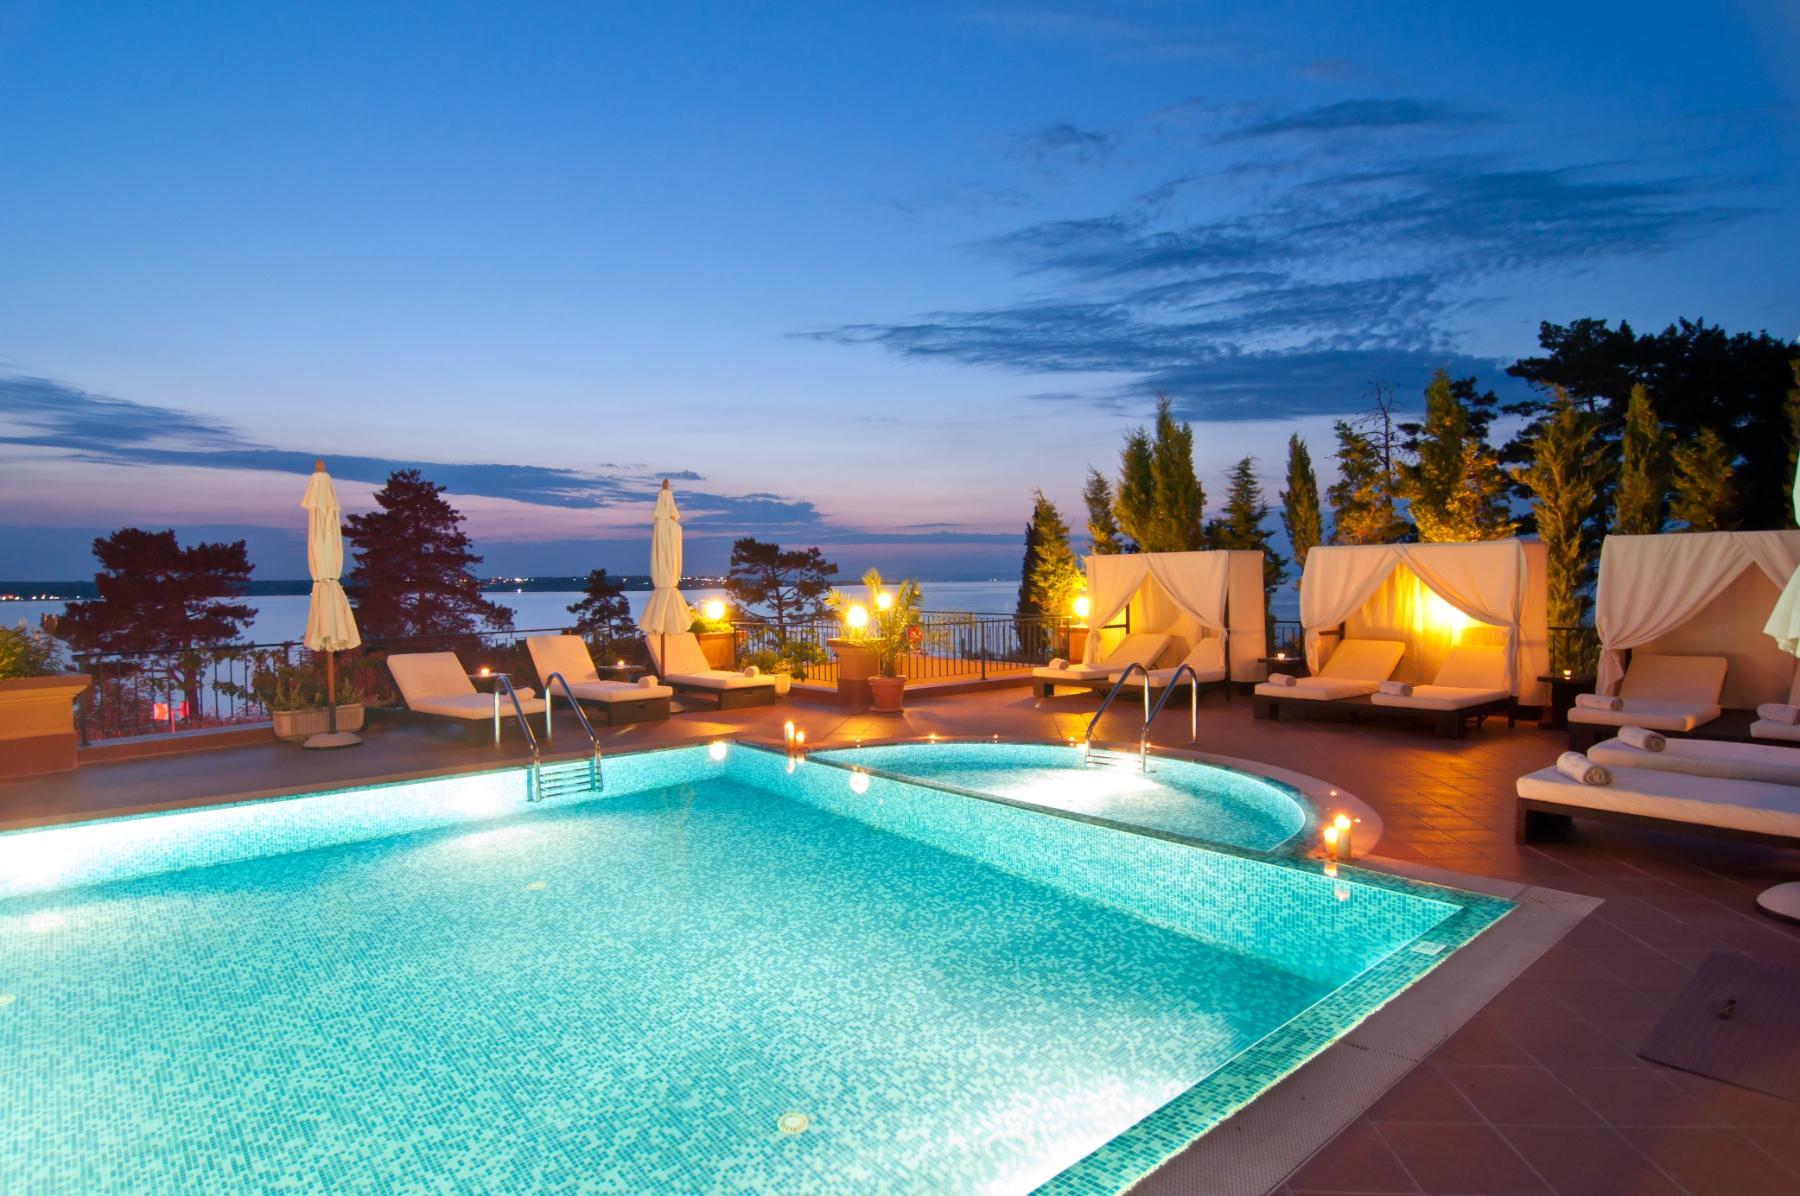 illuminazione notturna piscina